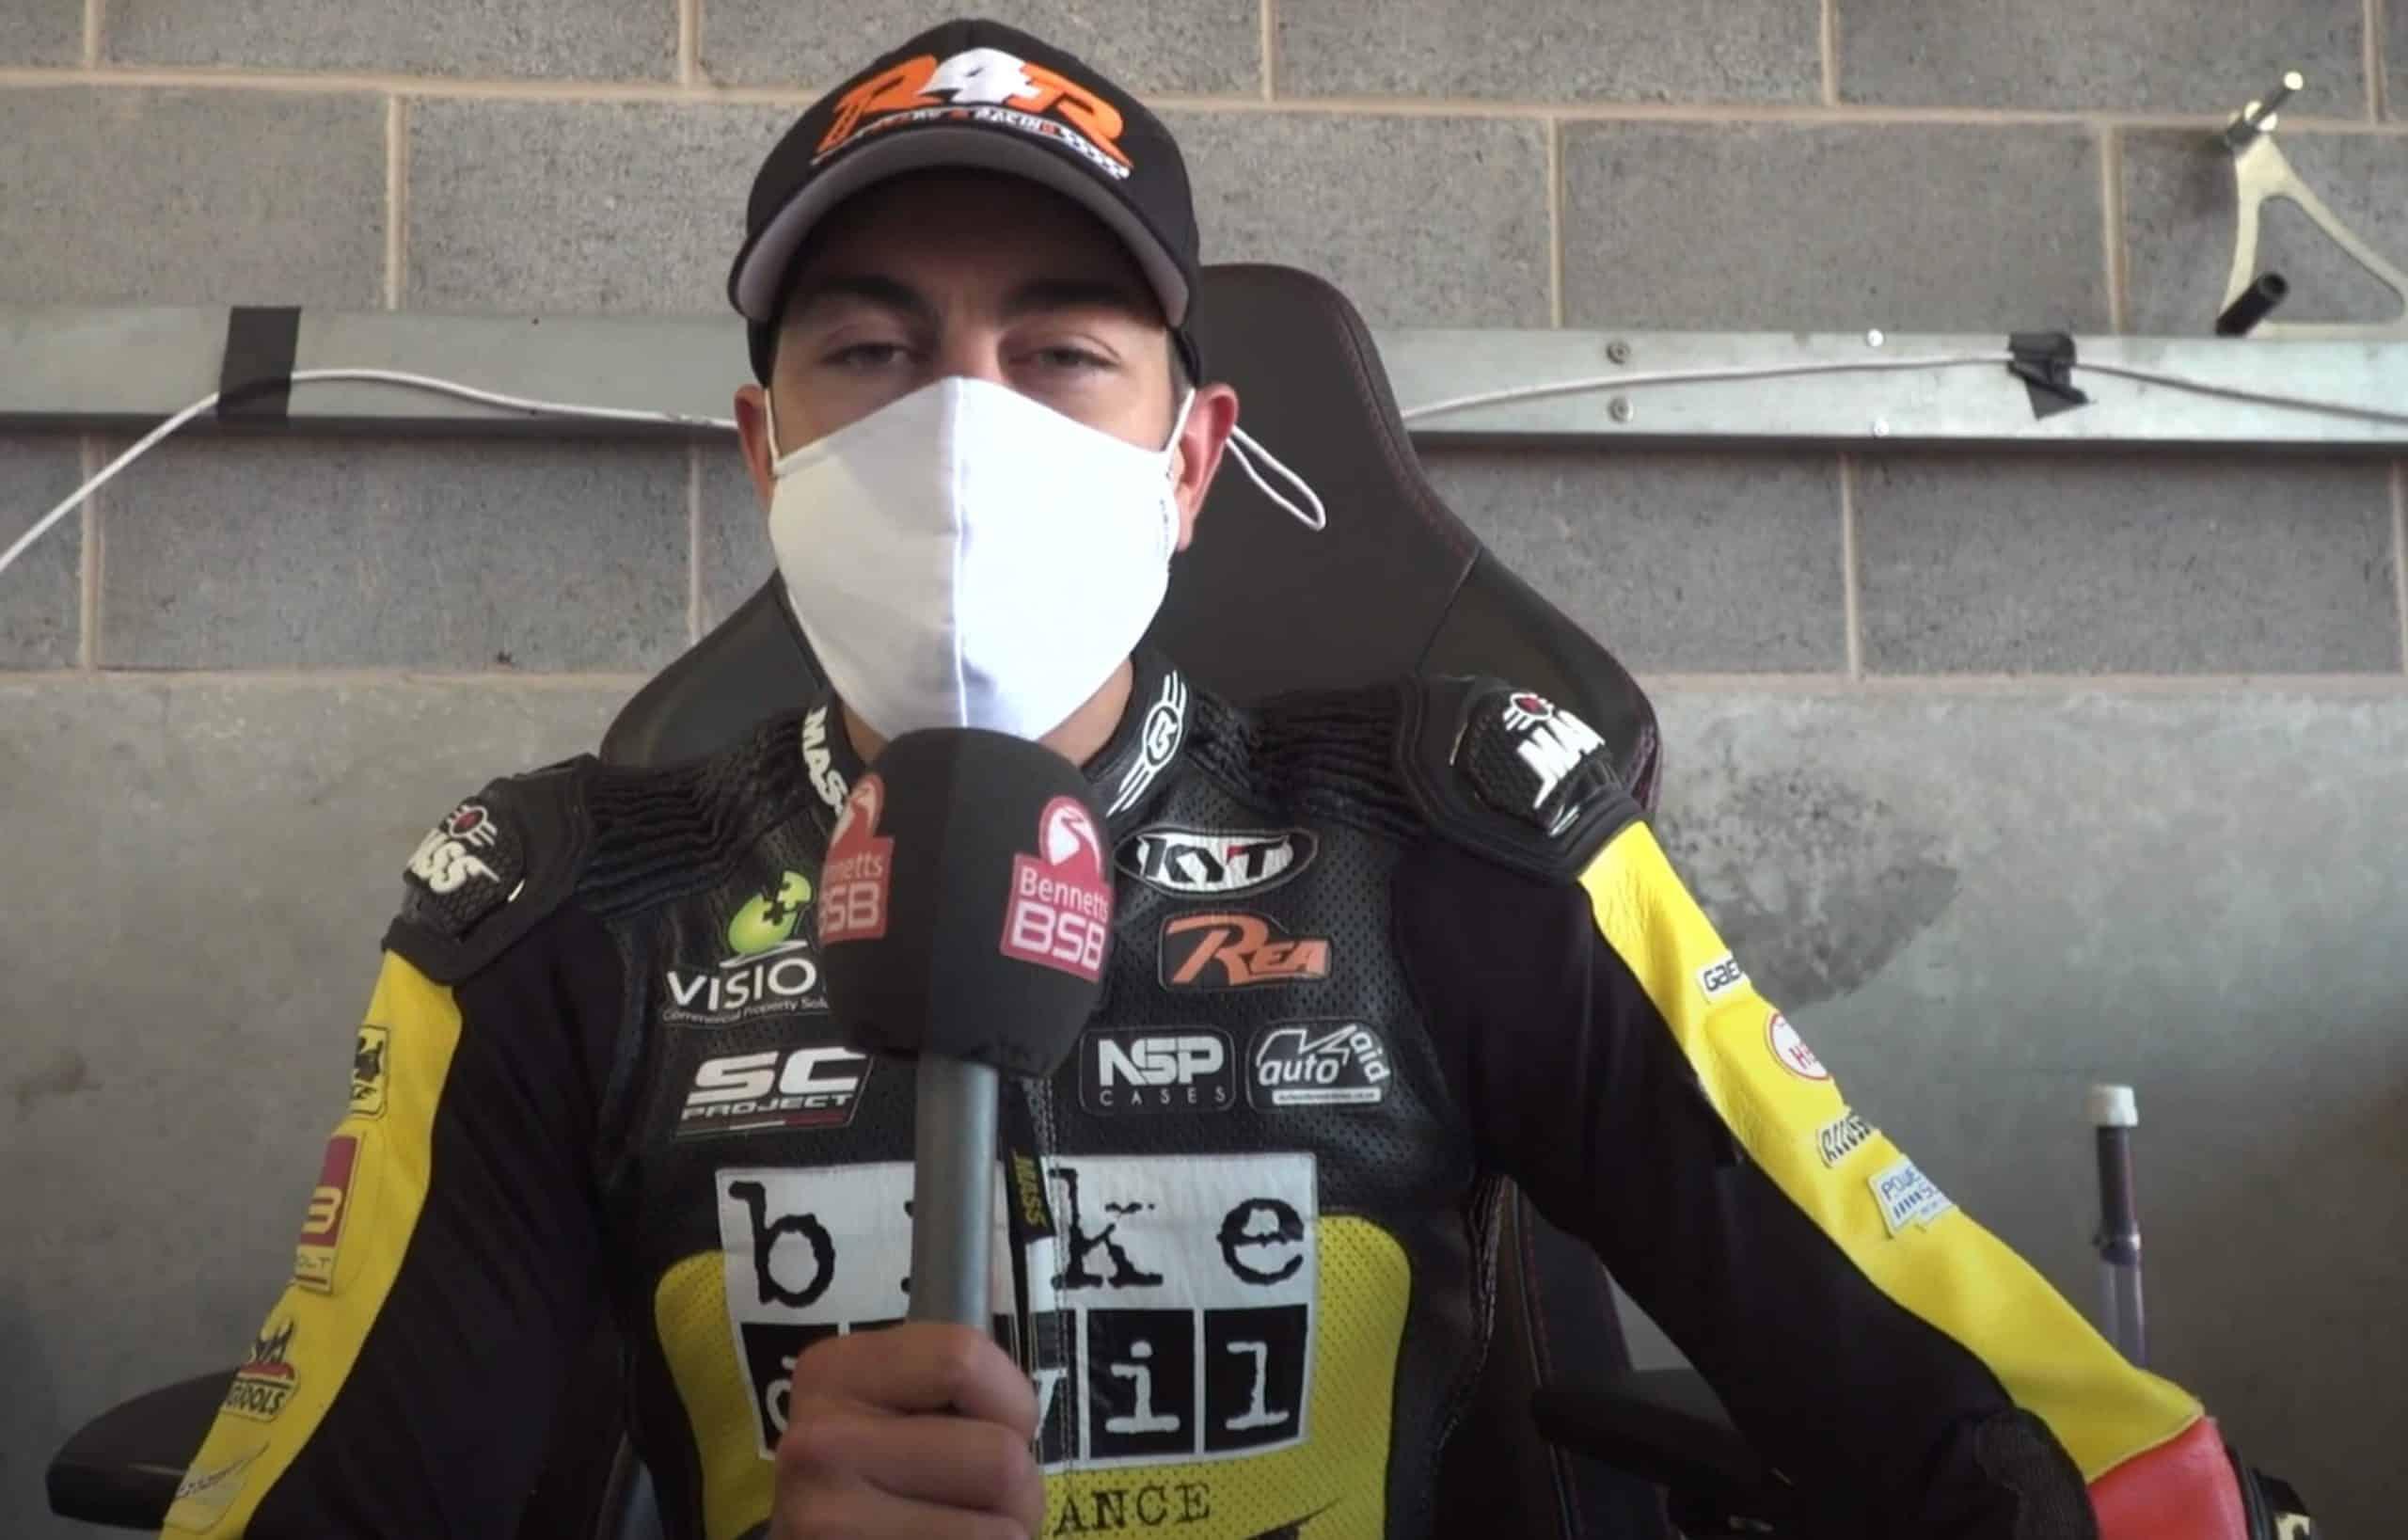 Gino Rea at Donnington Race Track, Bennetts BSB Restart 2020